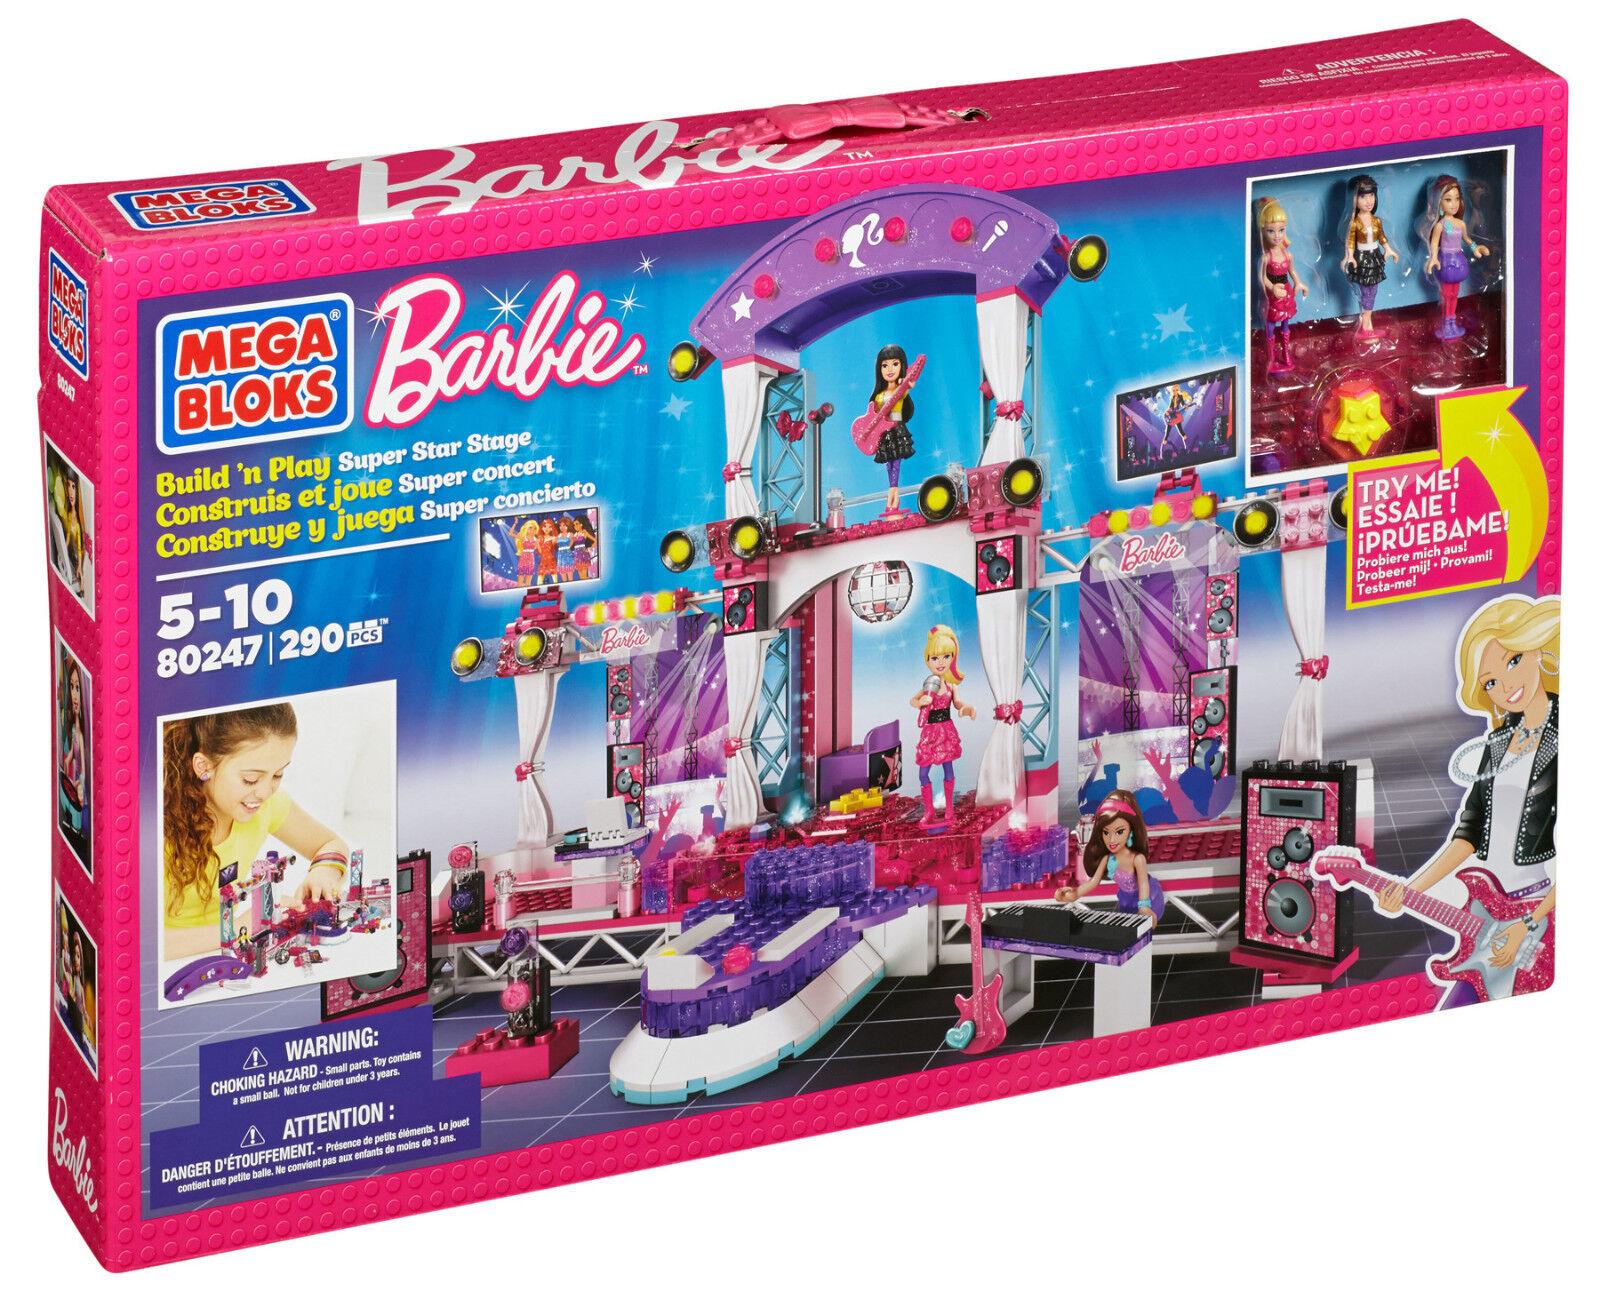 Mega - bloks barbie super star phase   80247 vollständig (lego - kompatibel)